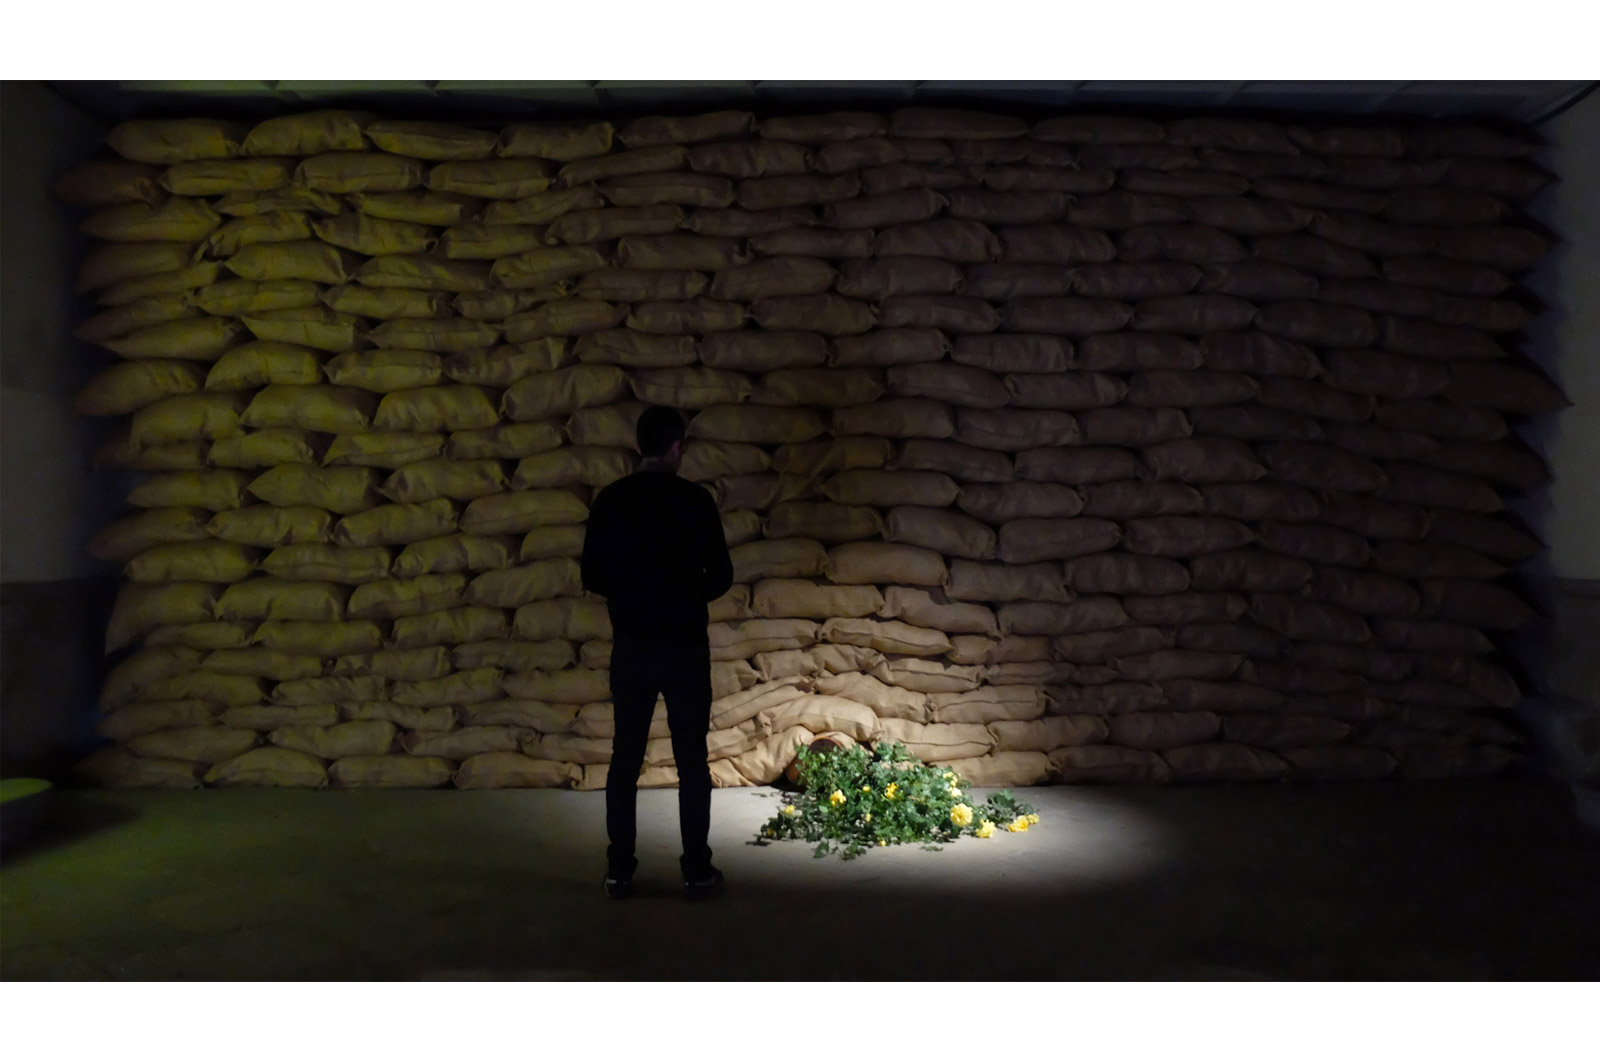 atelier4-anna-junca-la-resistencia-una-flor-temps-de-flors-antic-cinema-modern-efimera-444